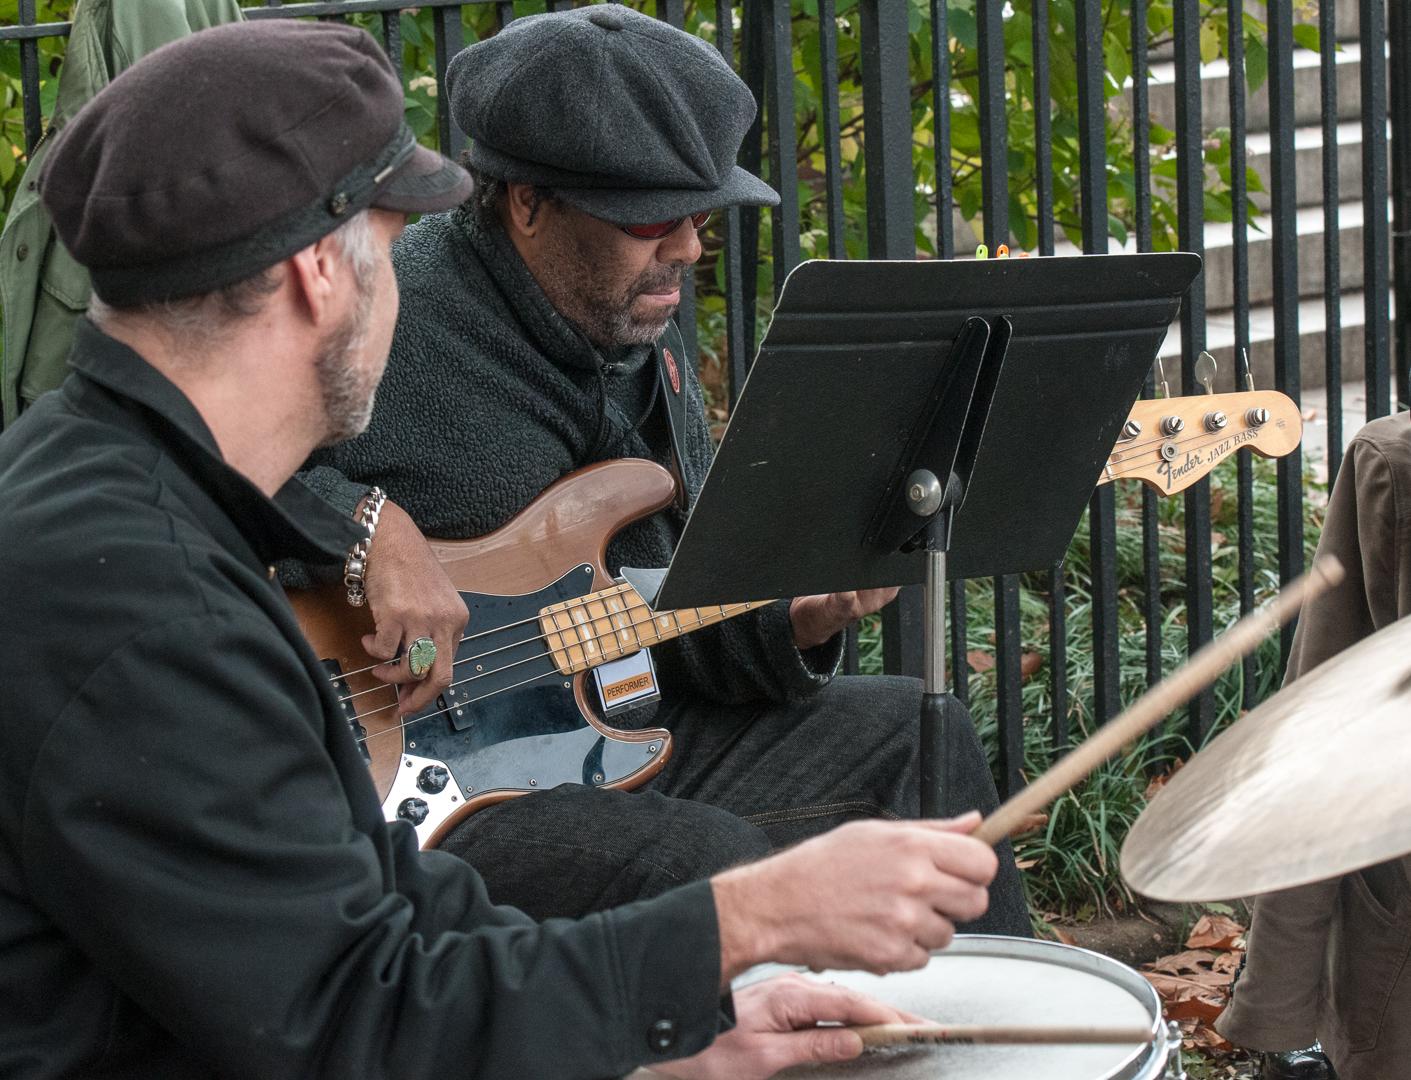 Tony Mason and Fred Cash with Marika Hughes & Bottom Heavy at Jazz and Colors in Central Park